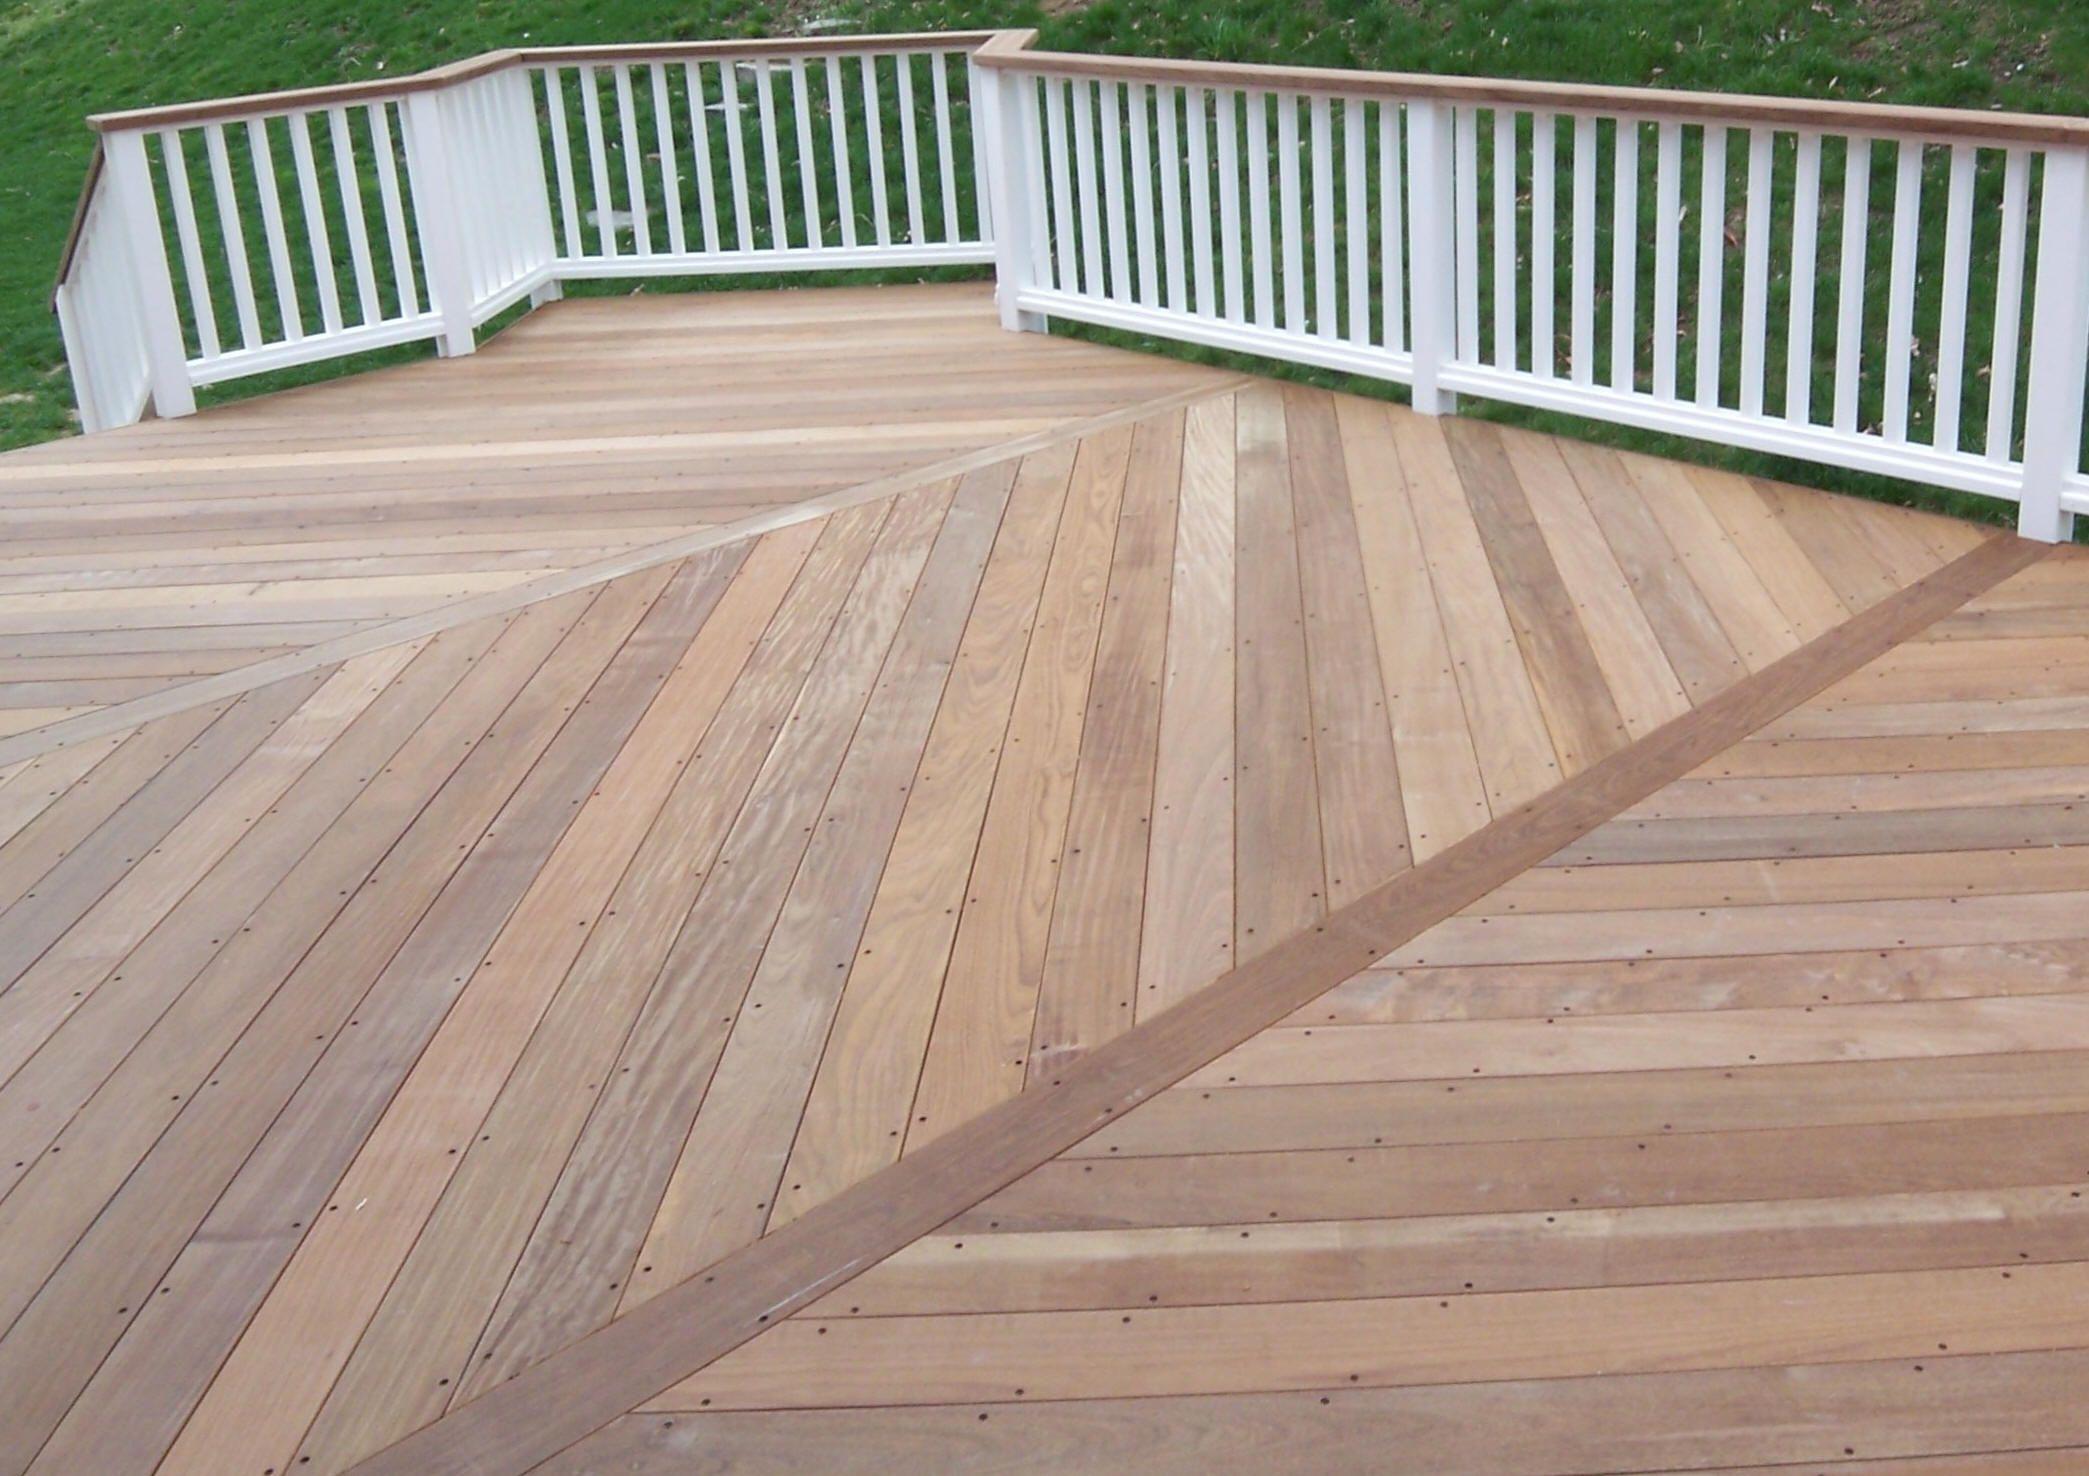 Online Estimate Pricing Page Deck Designs Backyard Wood Deck Designs Wood Deck